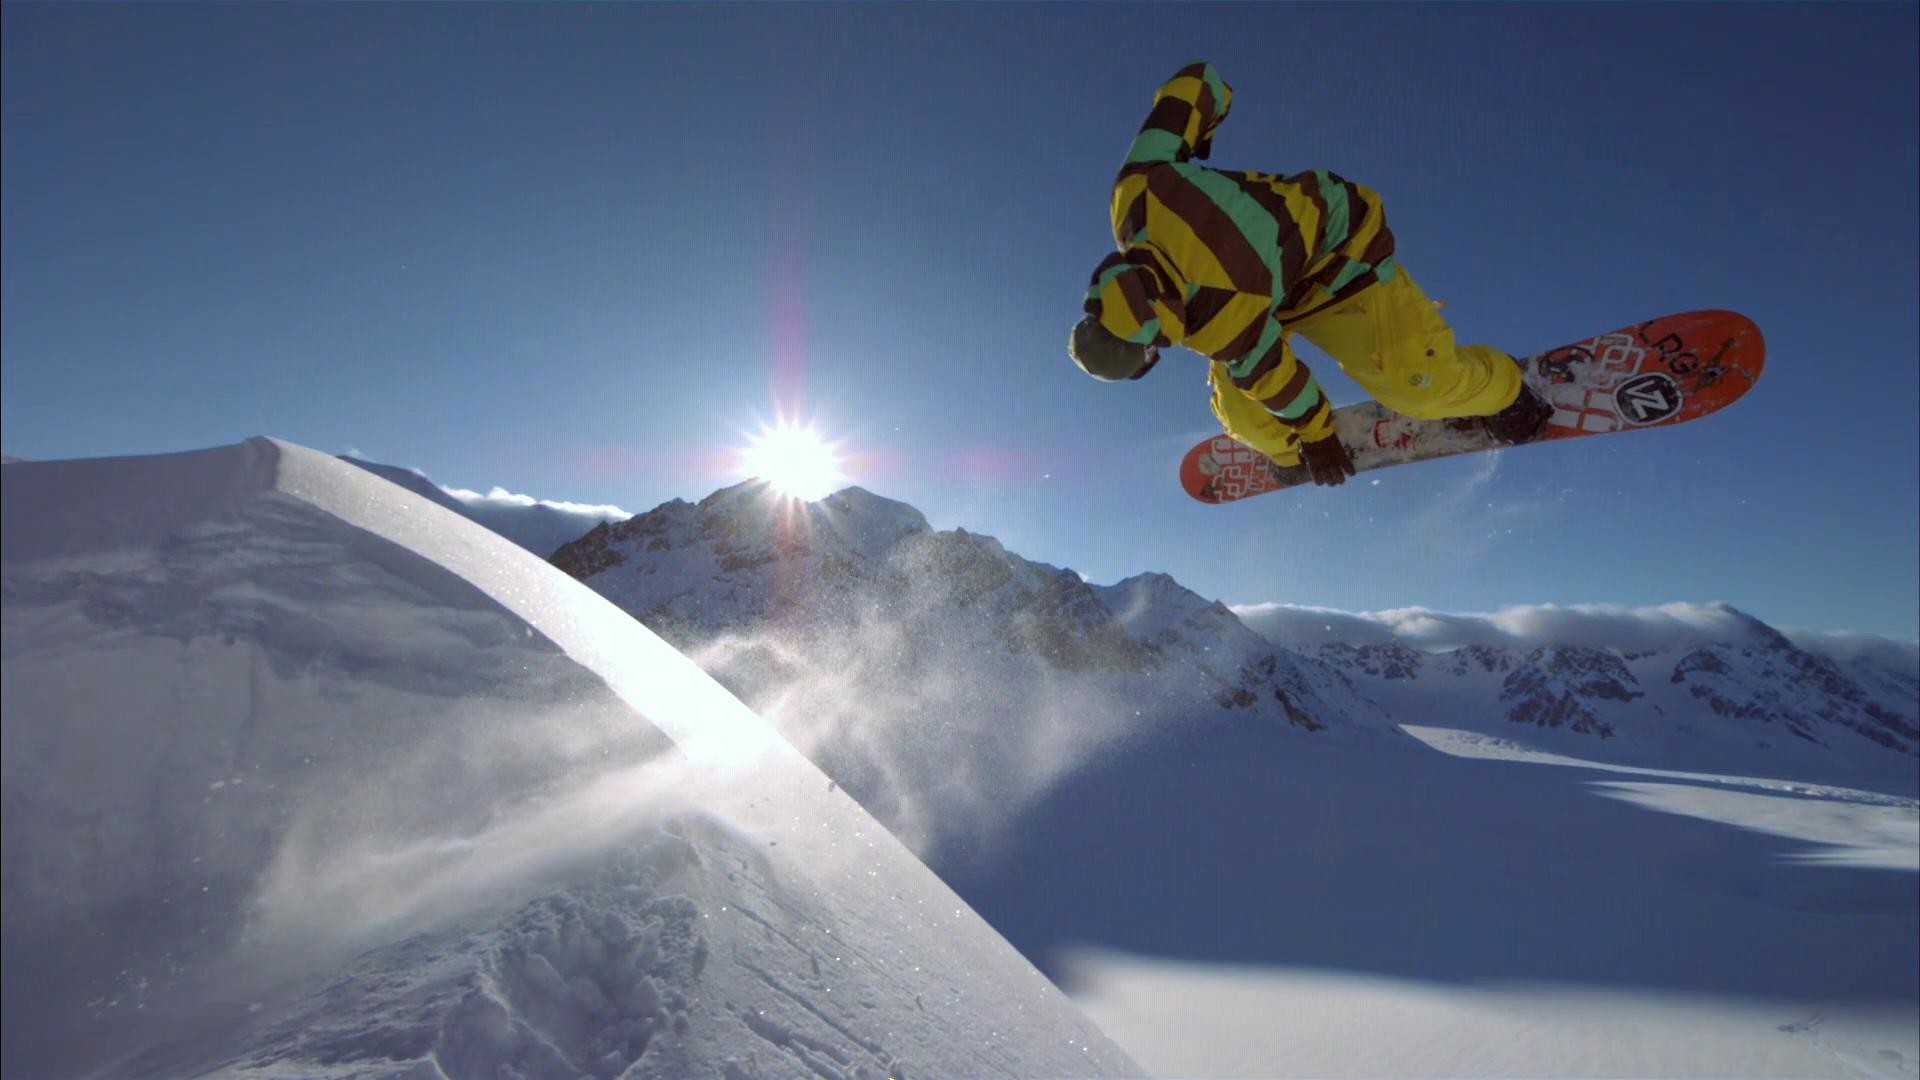 Wallpaper Hd Snowboarding Wallpaper Iphone: HD Snowboarding Wallpaper (72+ Images